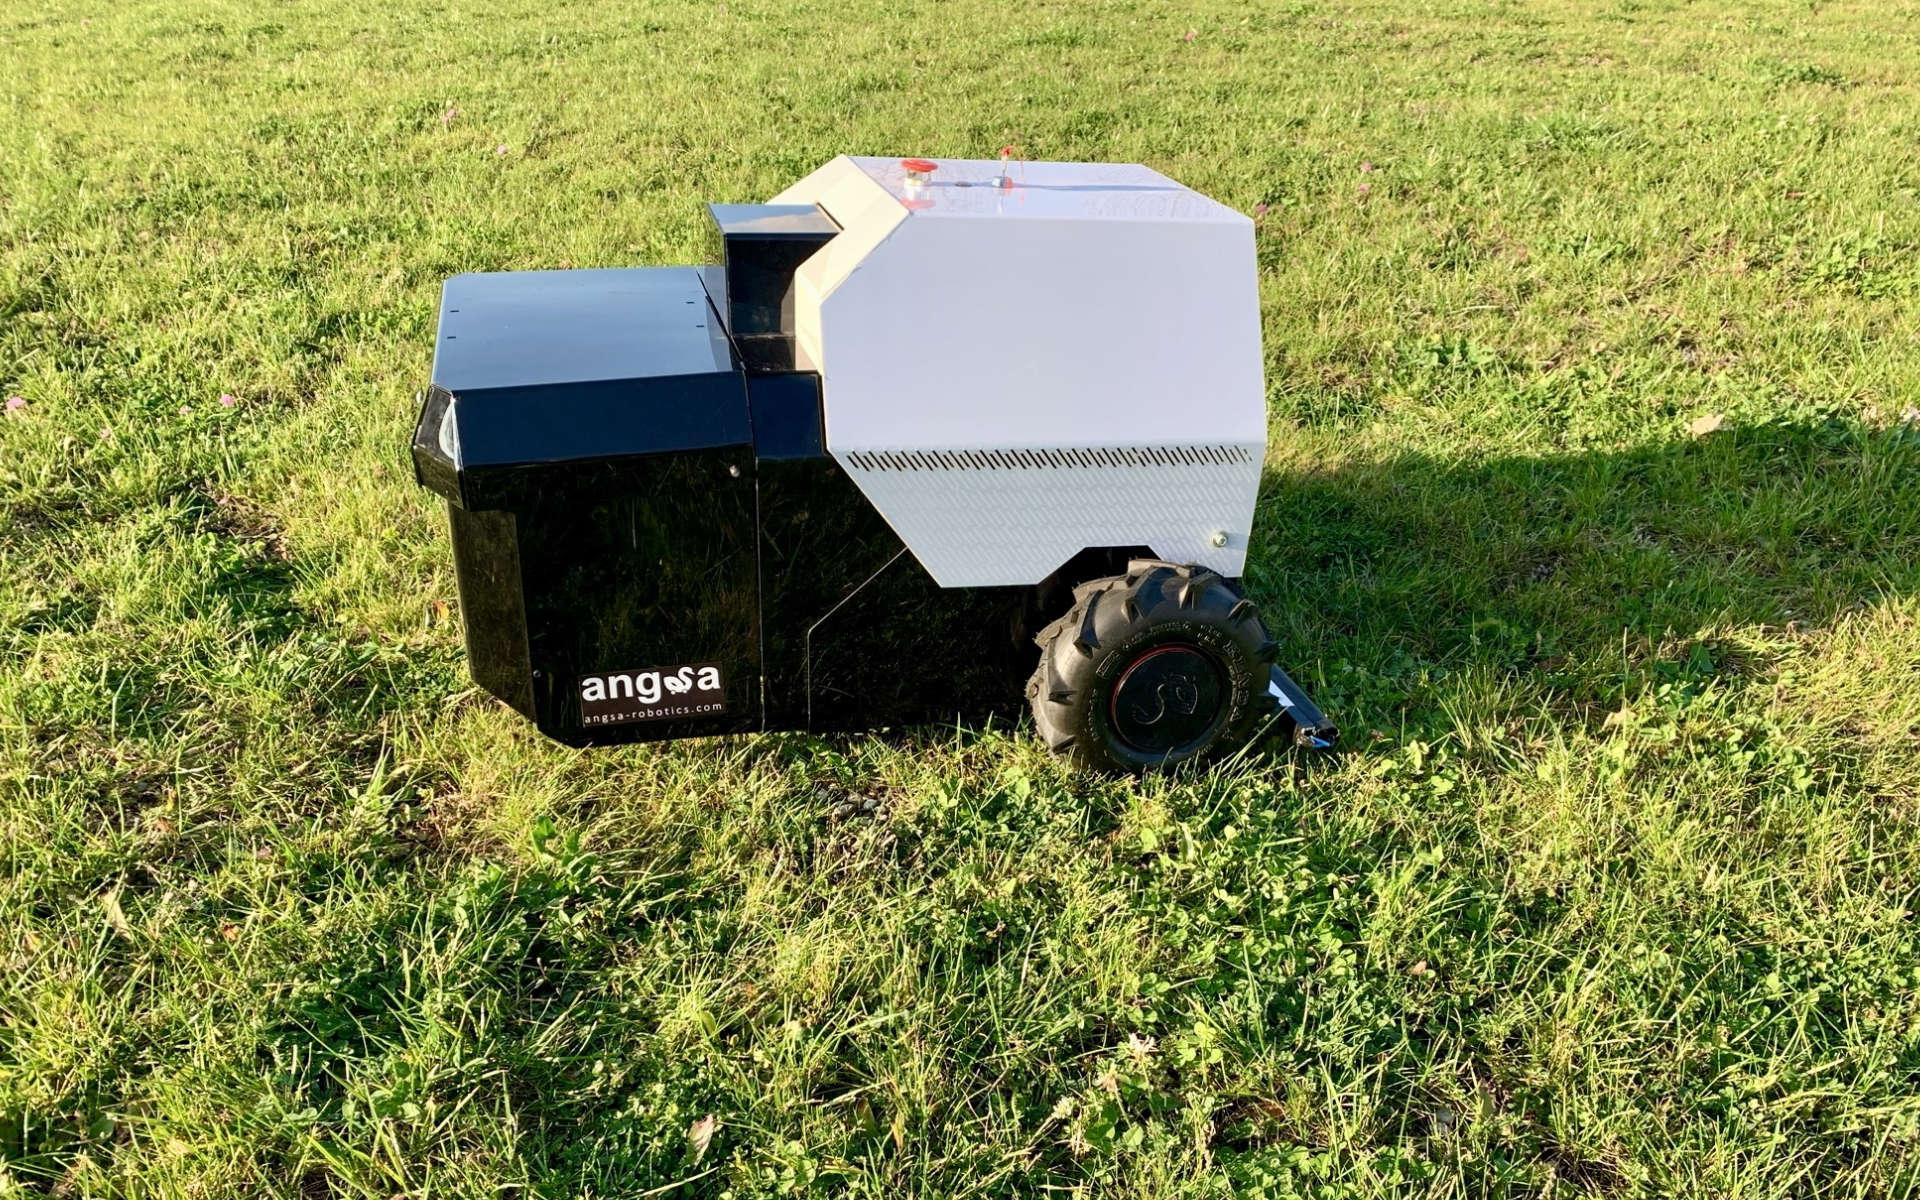 Foto von dem dritten Prototypen, Clive, des StartUps Angsa-Robotics